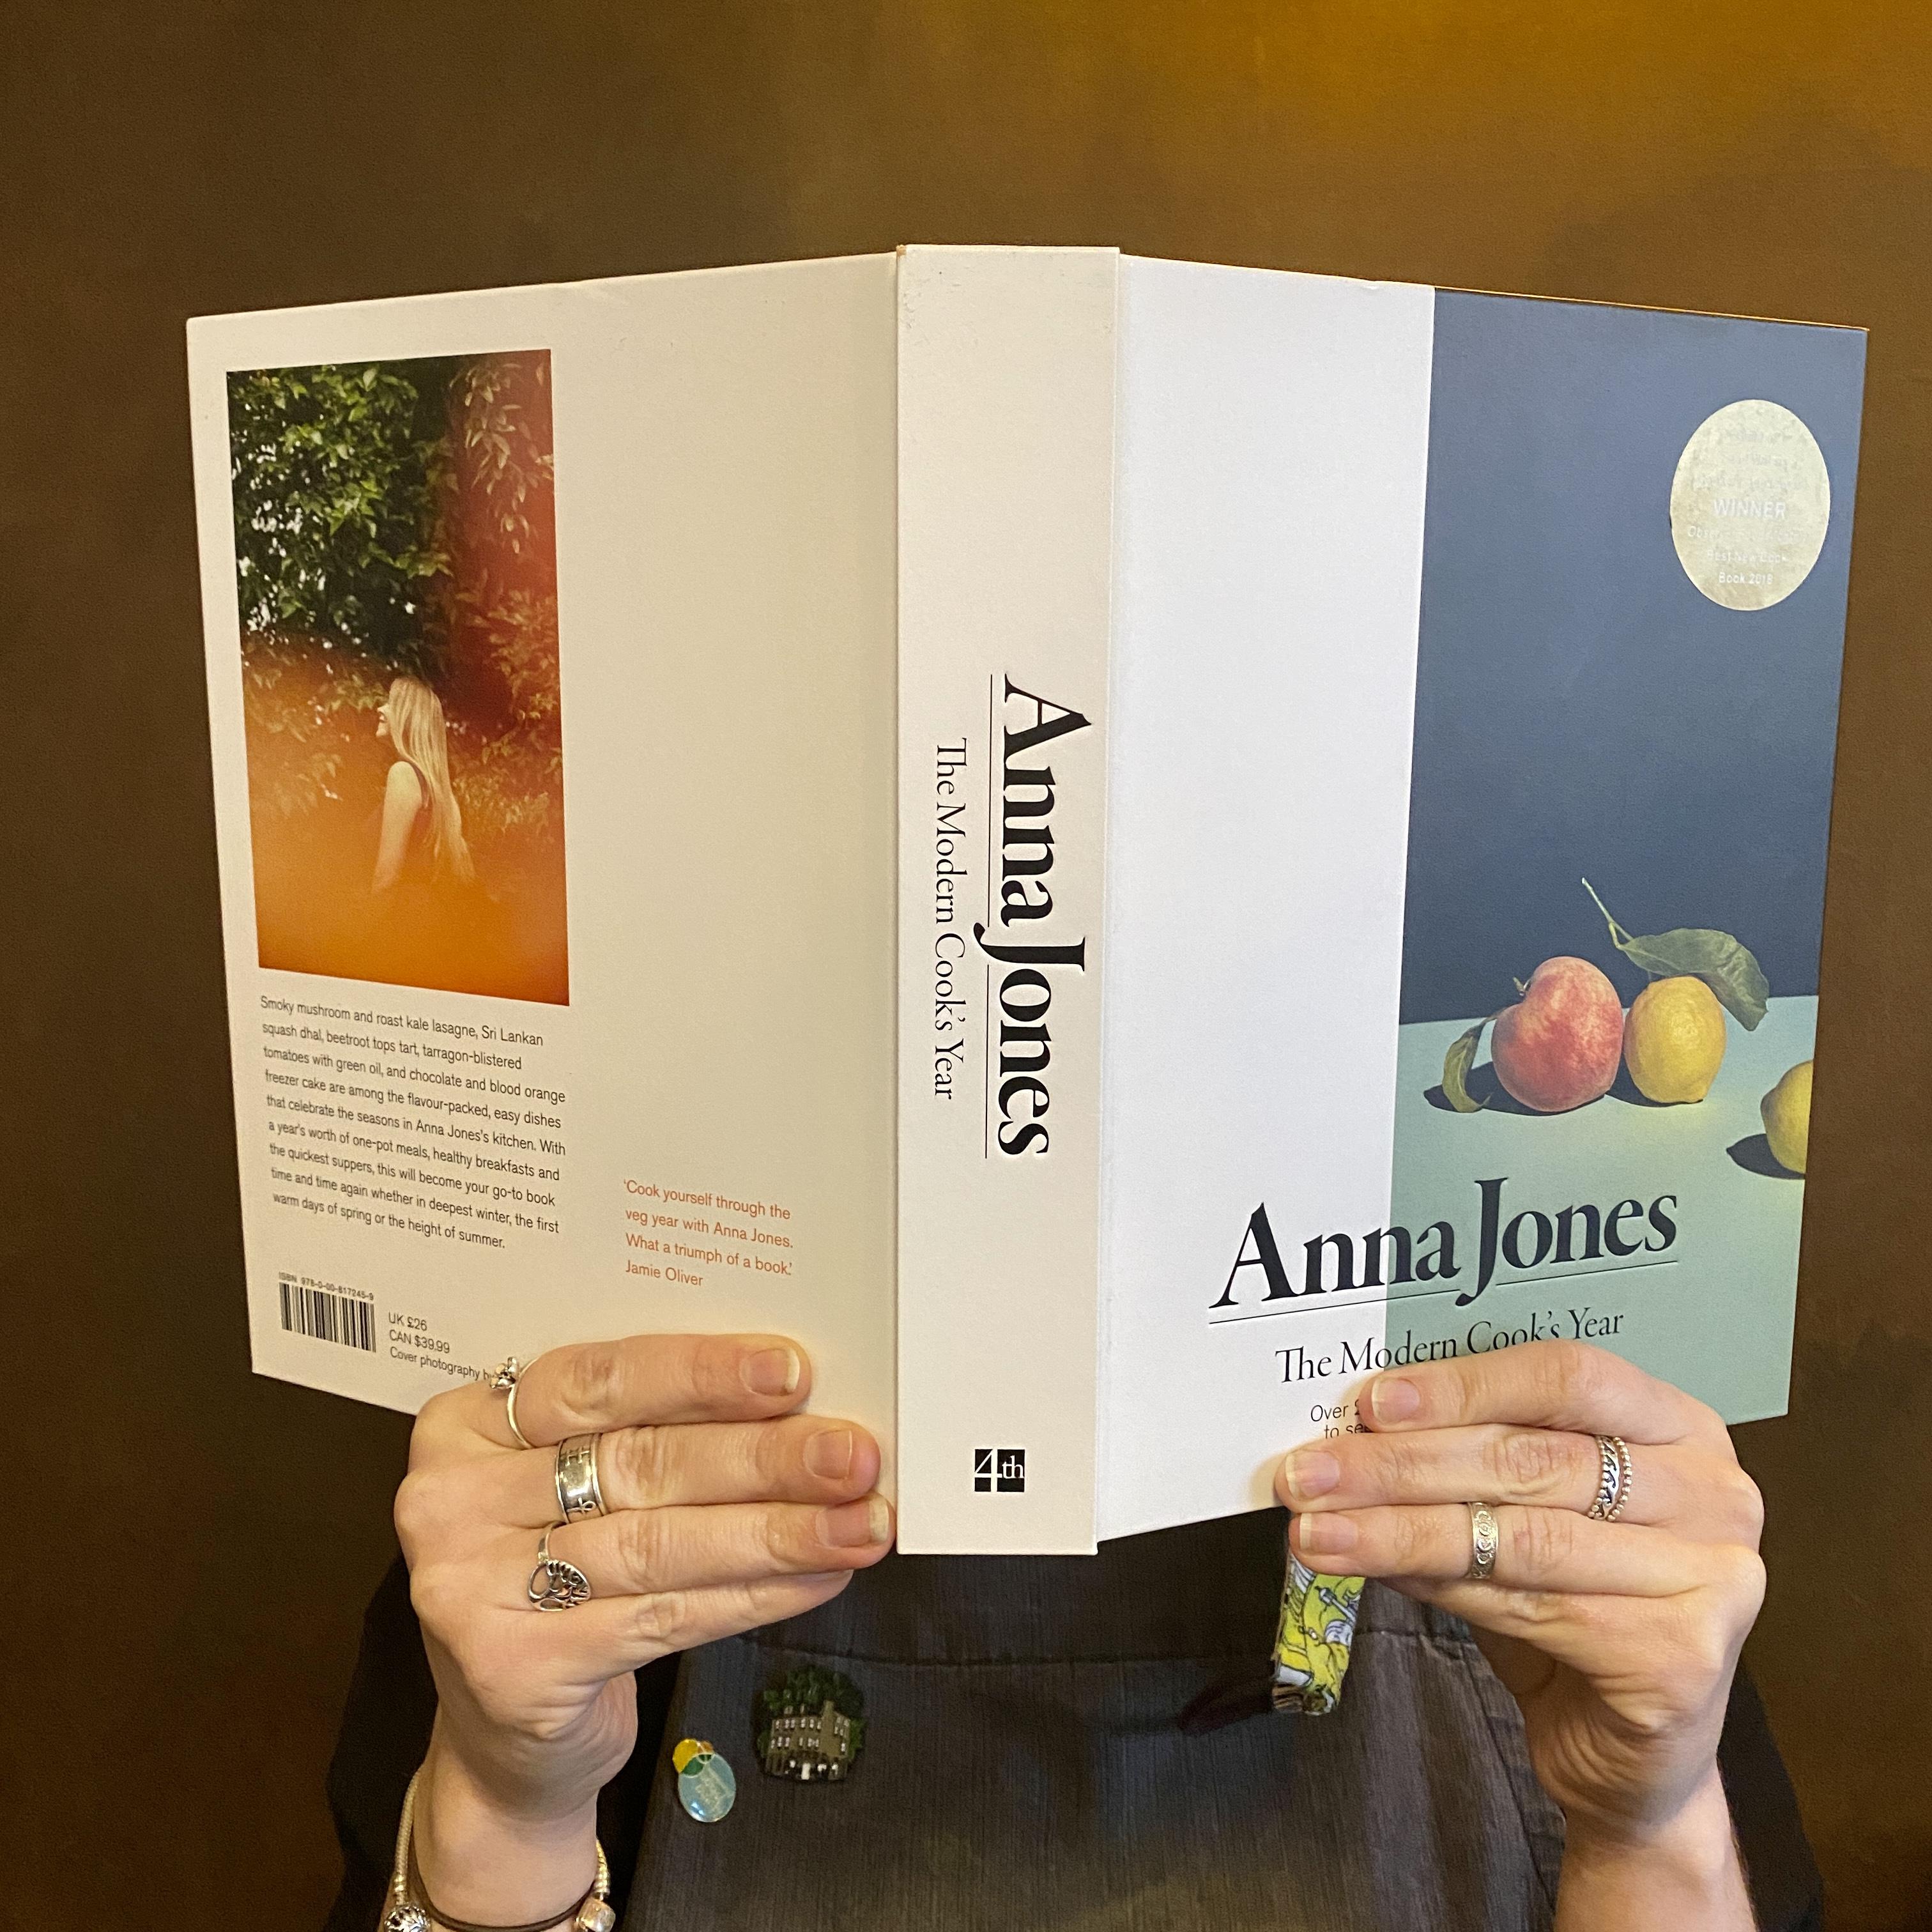 Anna Jones: The Modern Cook's Year